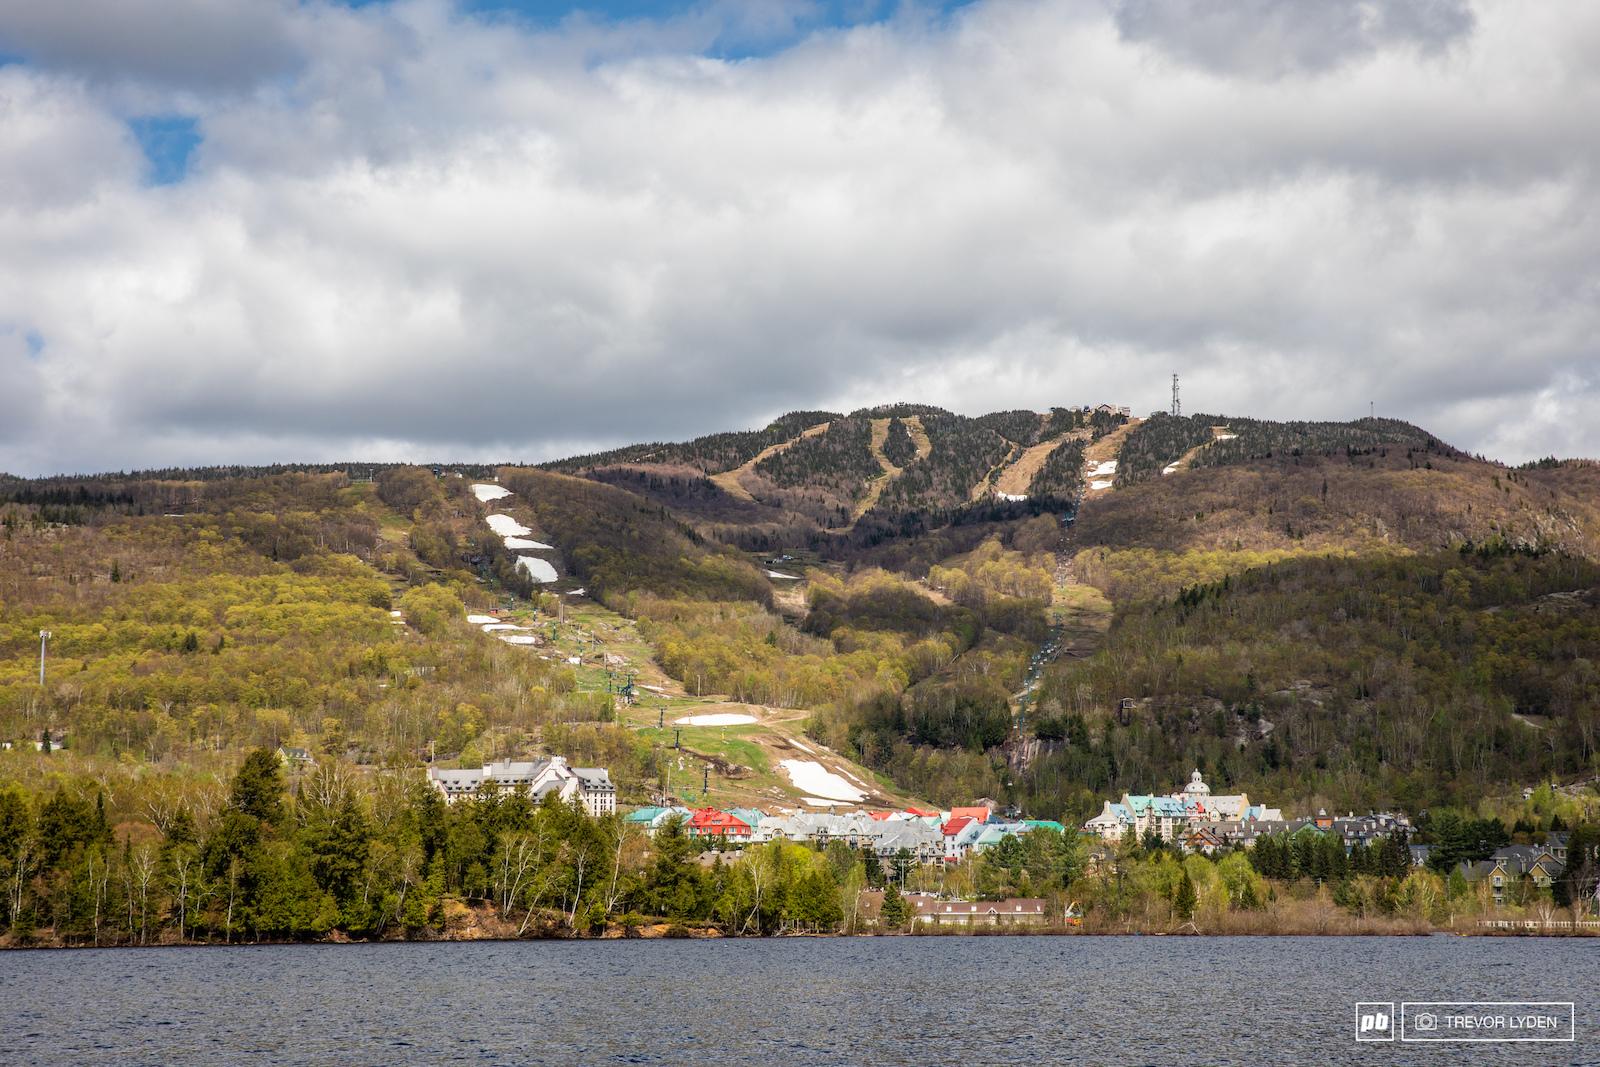 Looking back at Tremblant resort over Tremblant lake.